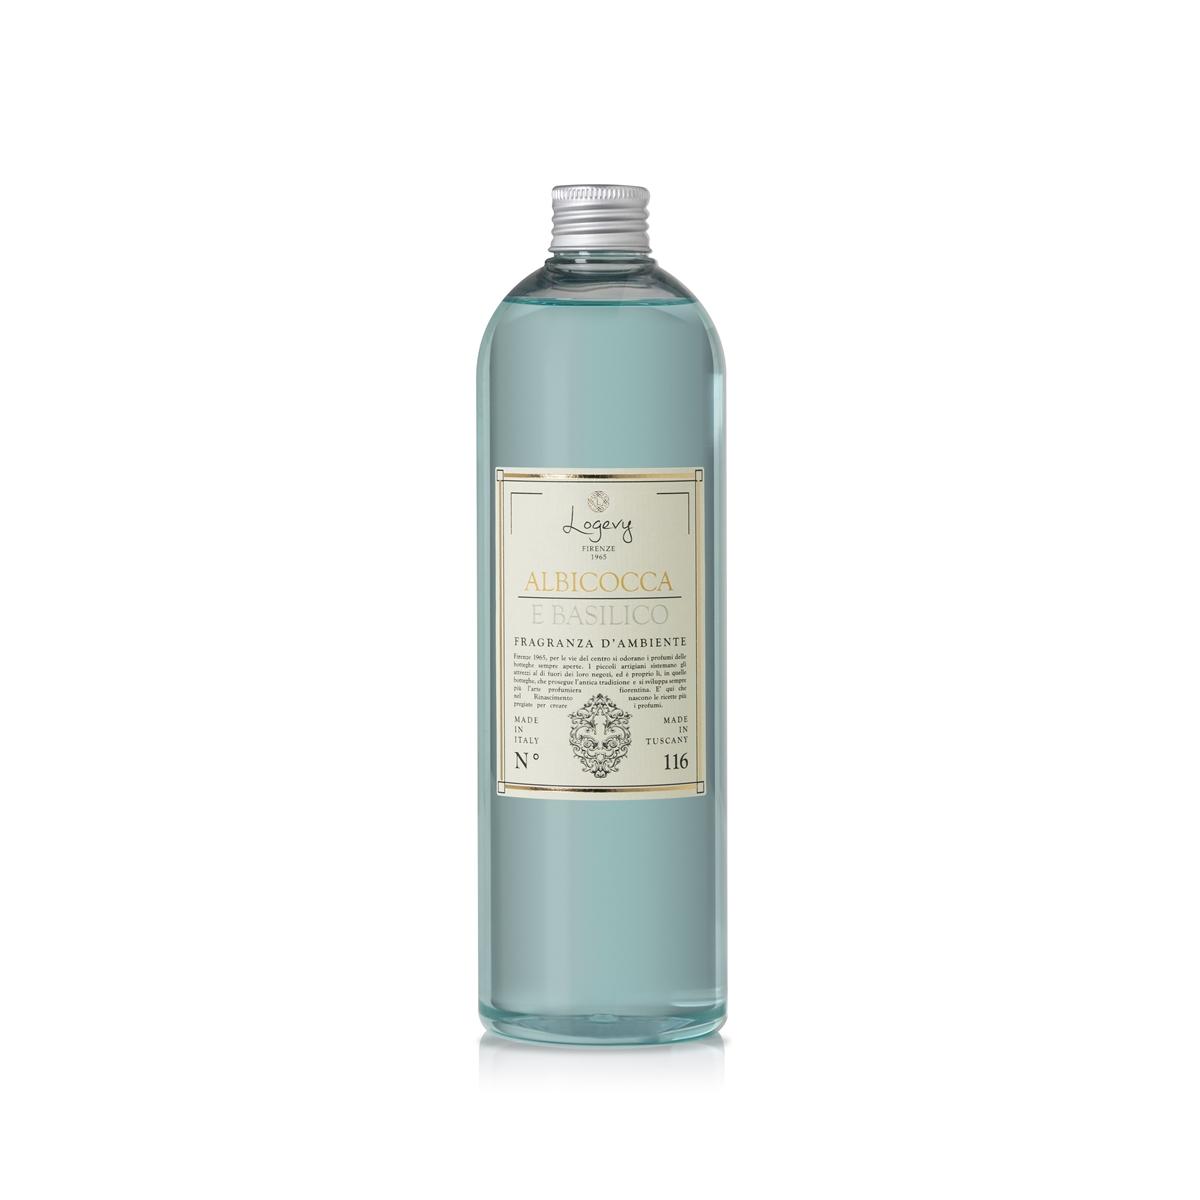 500 ml Nachfüllung Diffusers - Aprikose und Basilikum